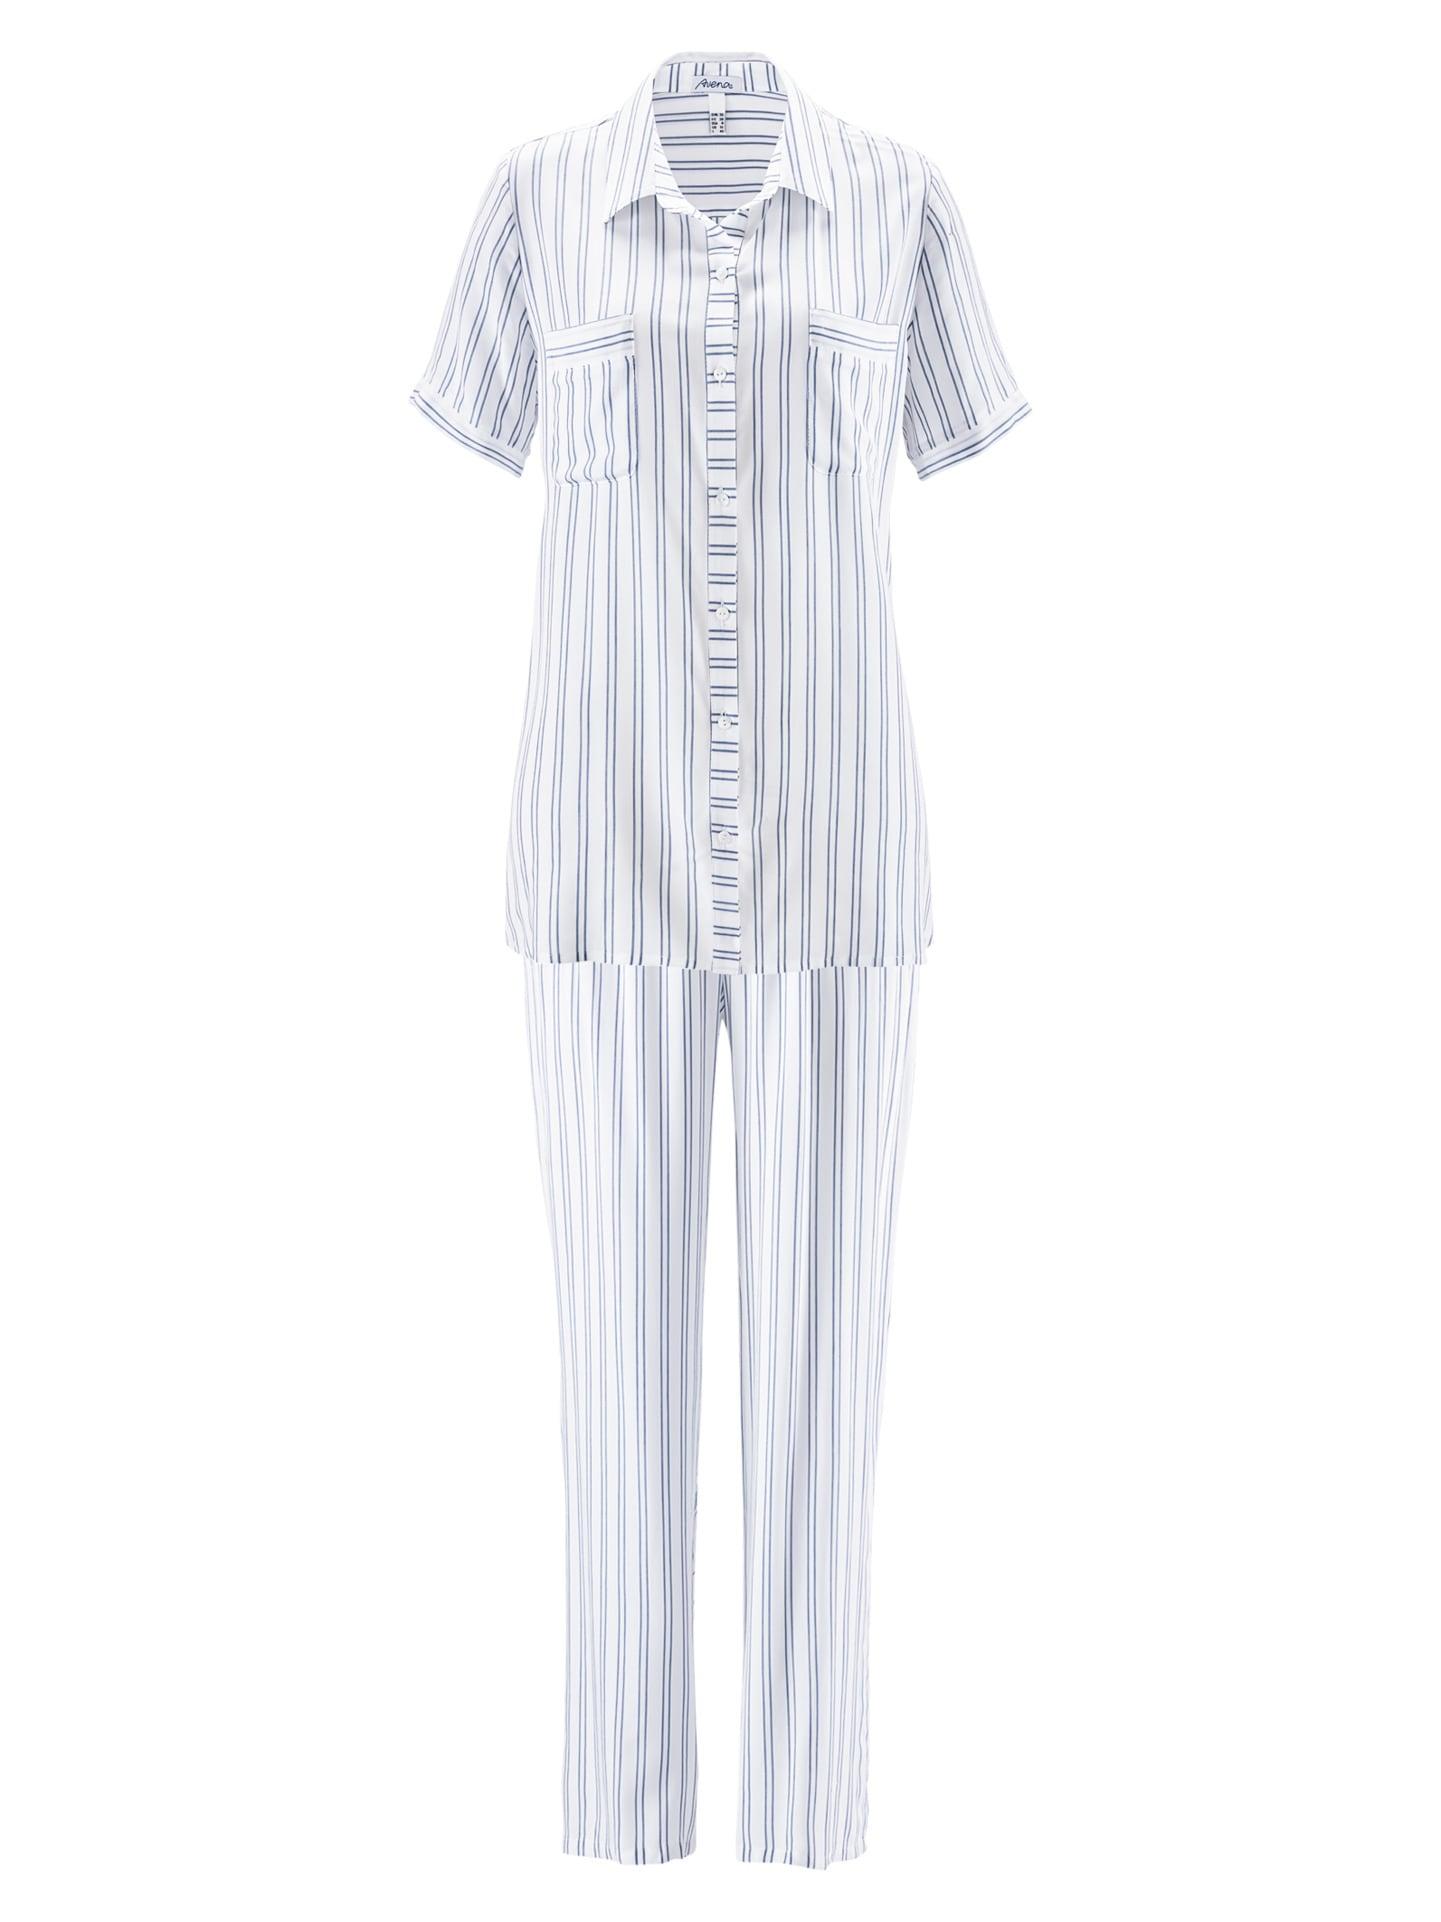 Avena Damen Pyjama Weiß gestreift 42-6132-8_MV8880